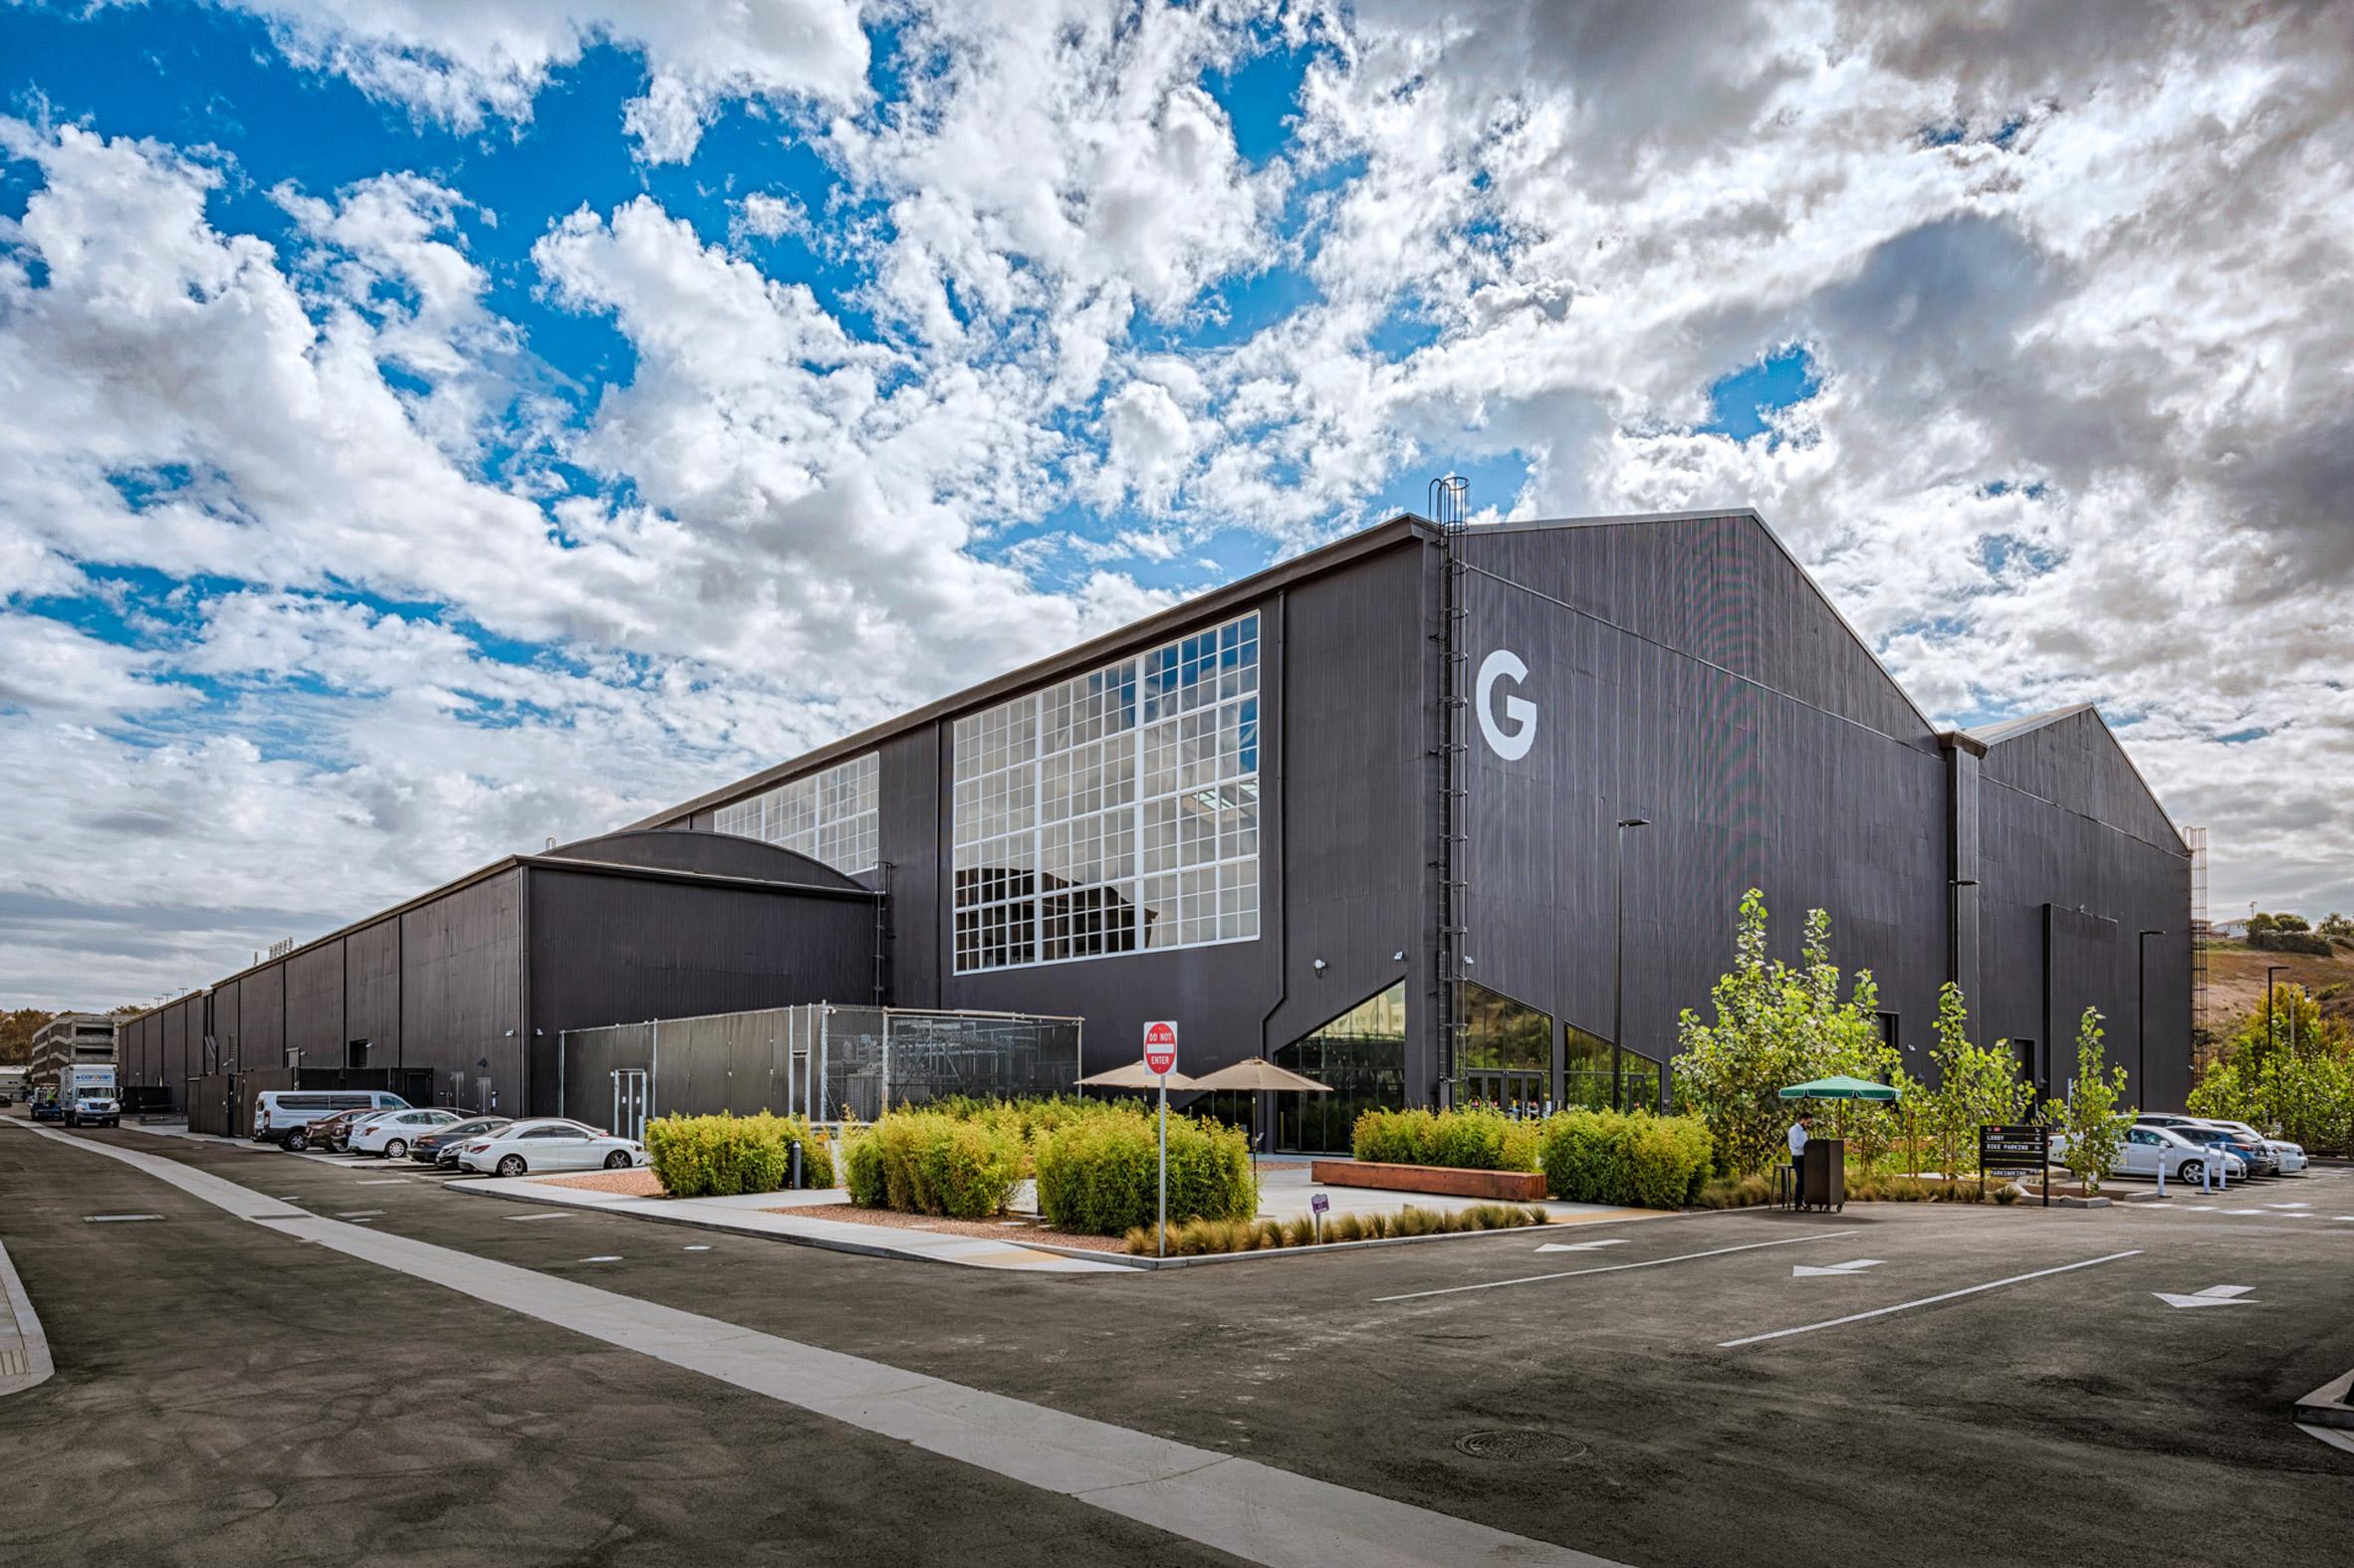 google-spruce-goose-hangar-architecture-zgf-los-angeles-california-usa_dezeen_2364_col_11.jpg